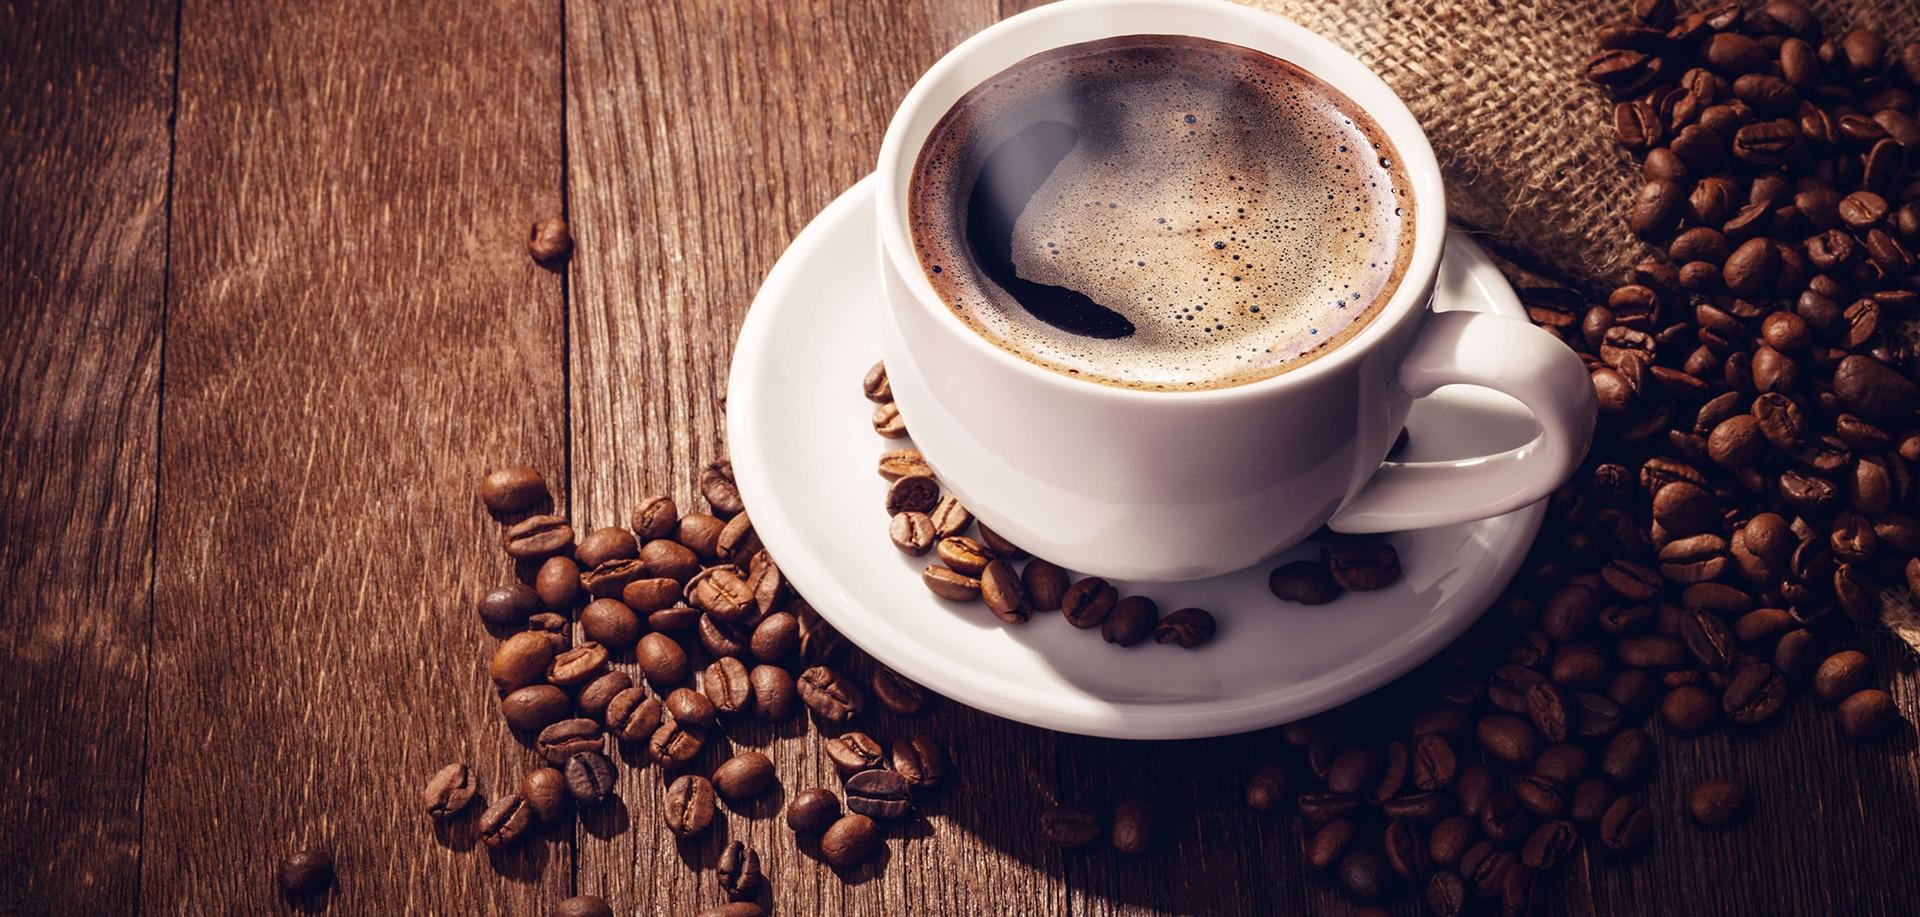 How to Make Coffee Less Acidic - Simple Methods